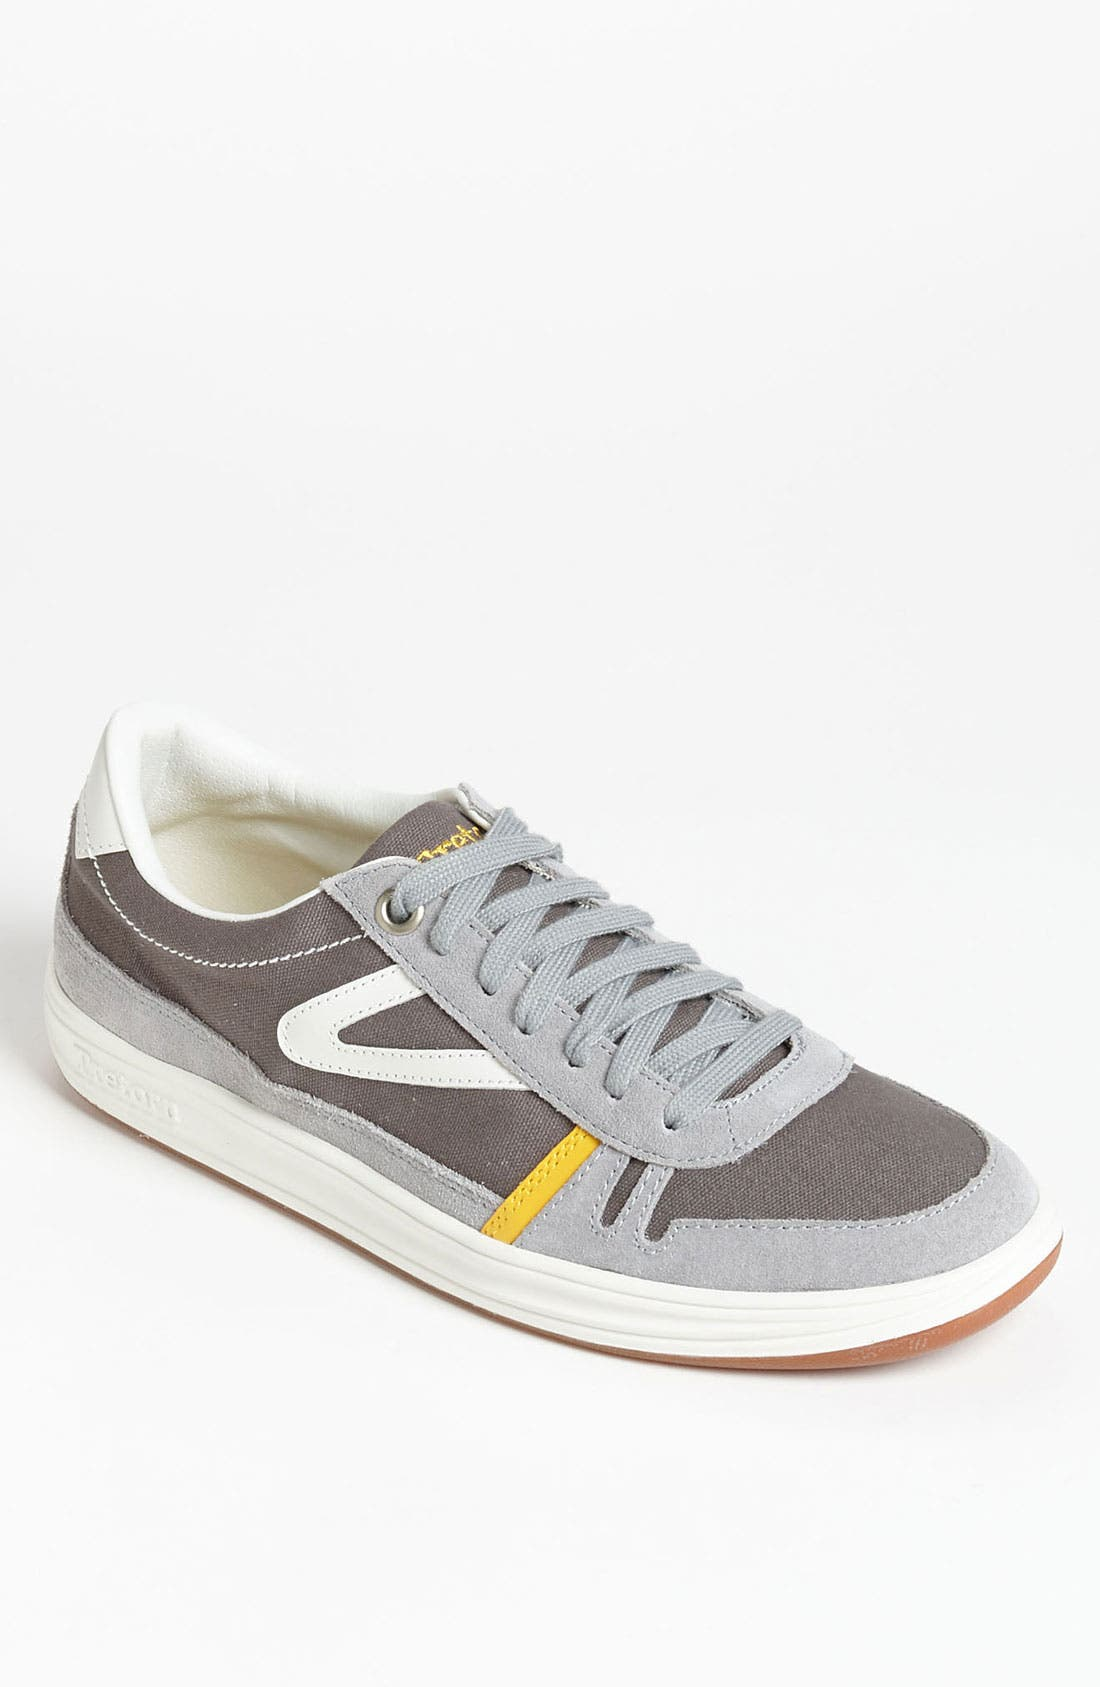 Alternate Image 1 Selected - Tretorn 'Rodlera' Sneaker (Men)